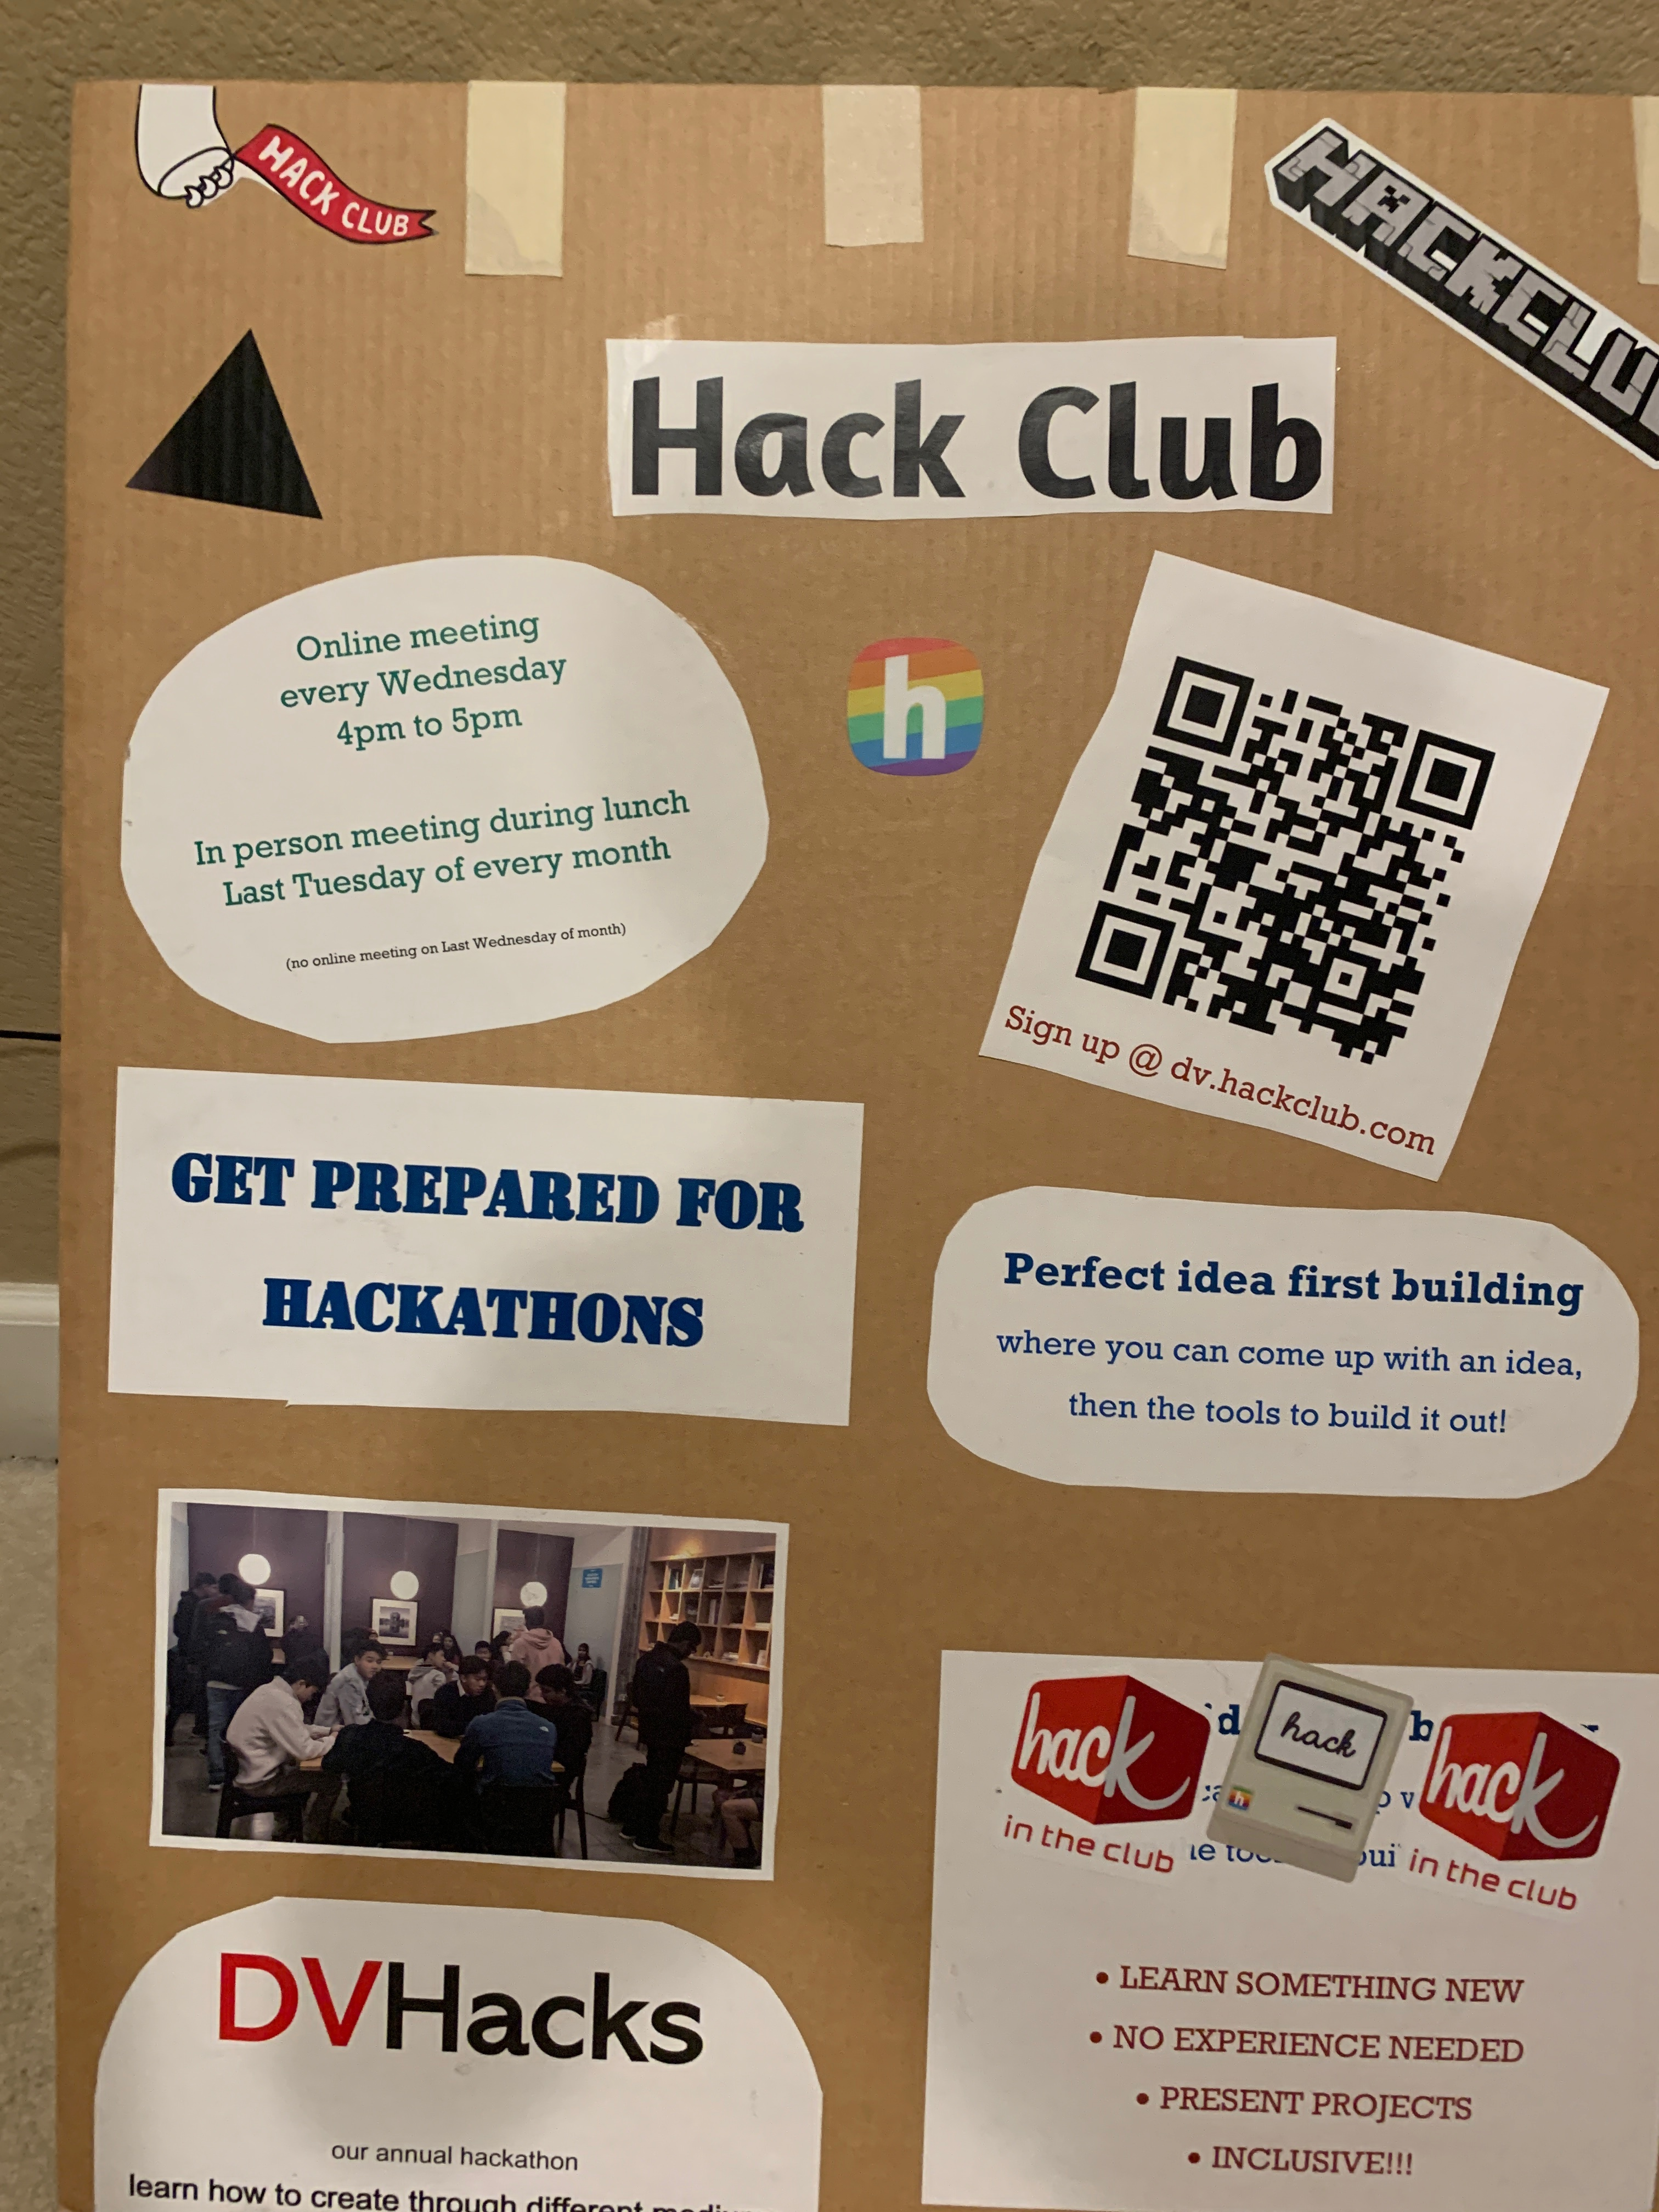 https://cloud-3wc8sw45q-hack-club-bot.vercel.app/0img_1705.jpeg